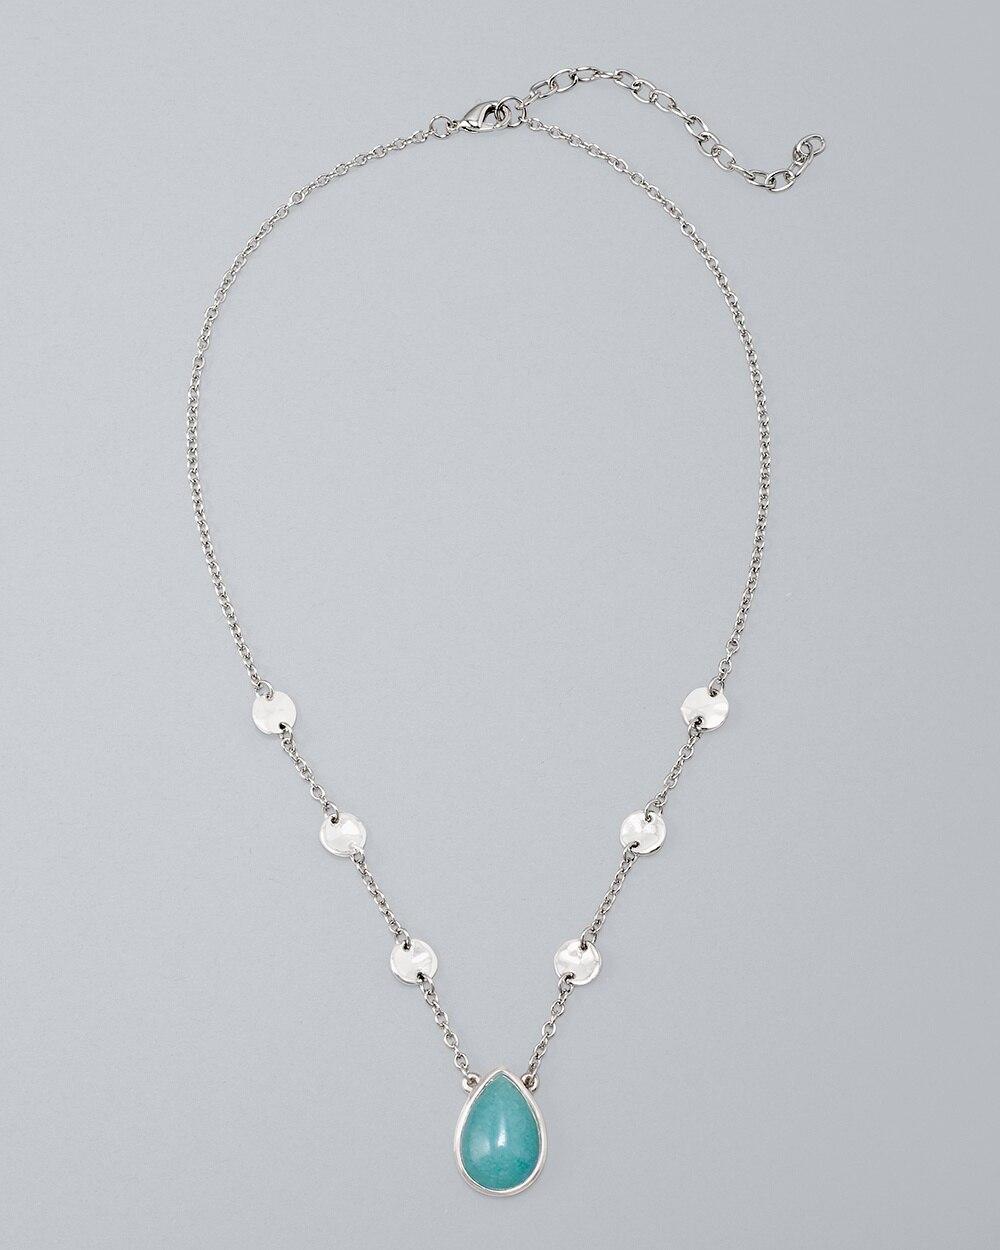 9c8de7634375a7 Jade Teardrop Pendant Necklace - White House Black Market